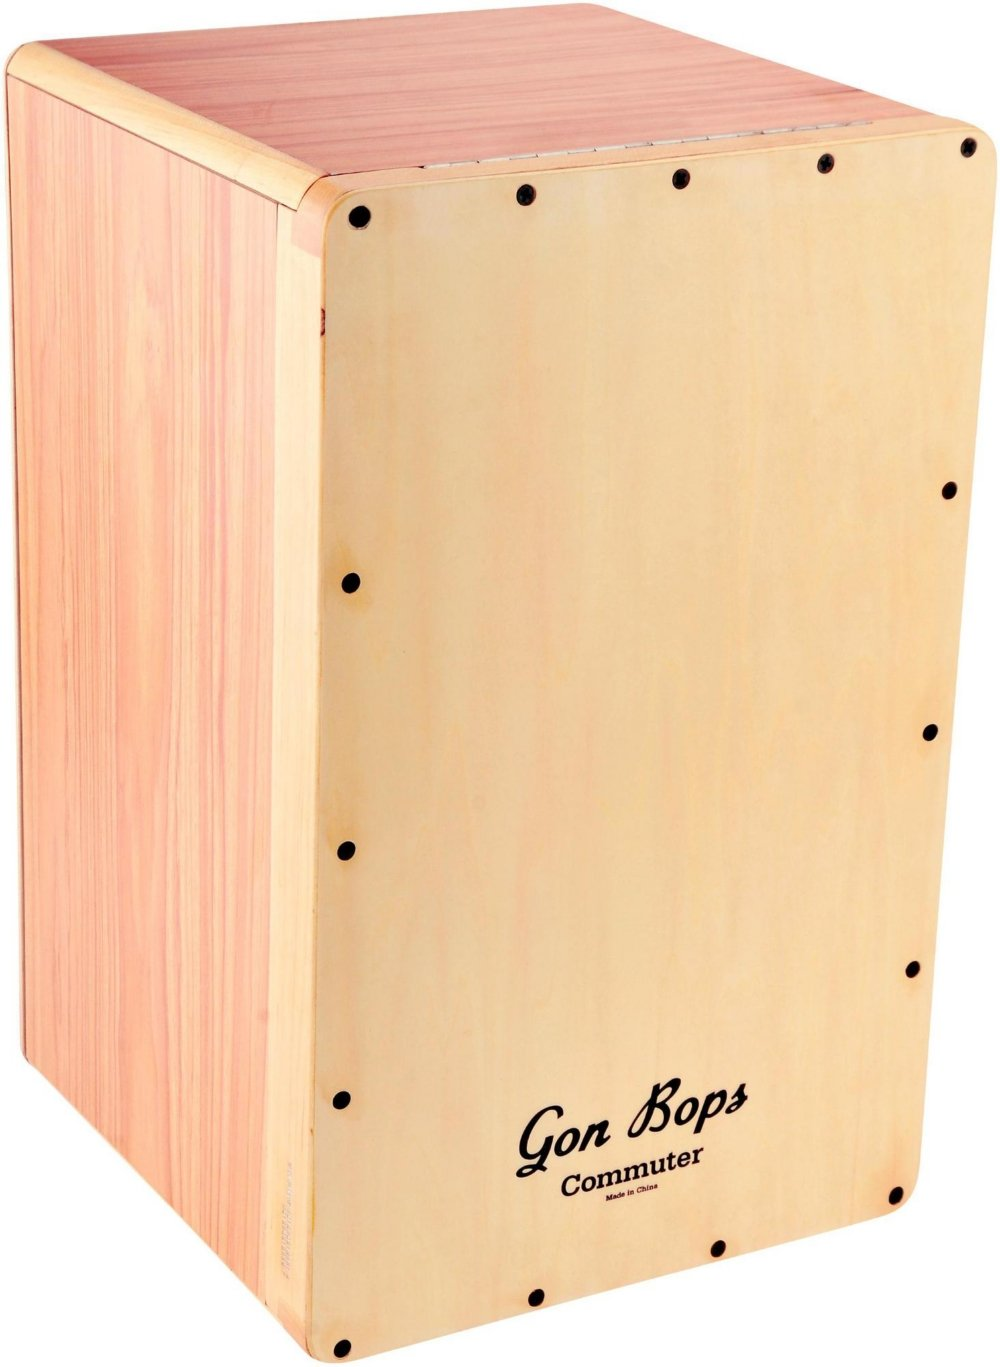 Gon Bops ゴンボップス折りたたみ式カホン Commuter Cajon  GON-CJCOM   B011TIABL4